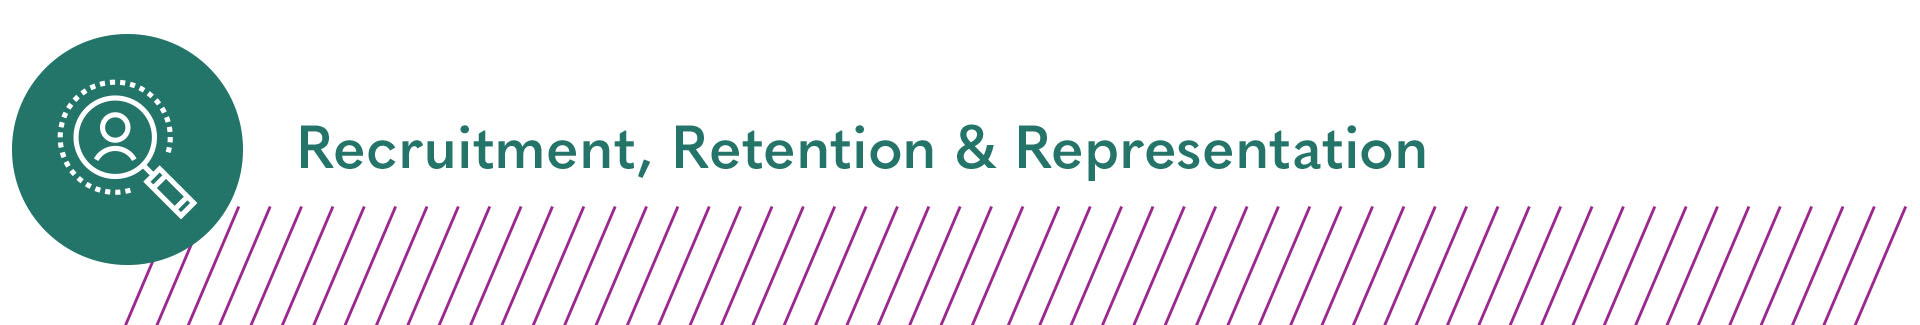 Recruitment, Retention & Representation